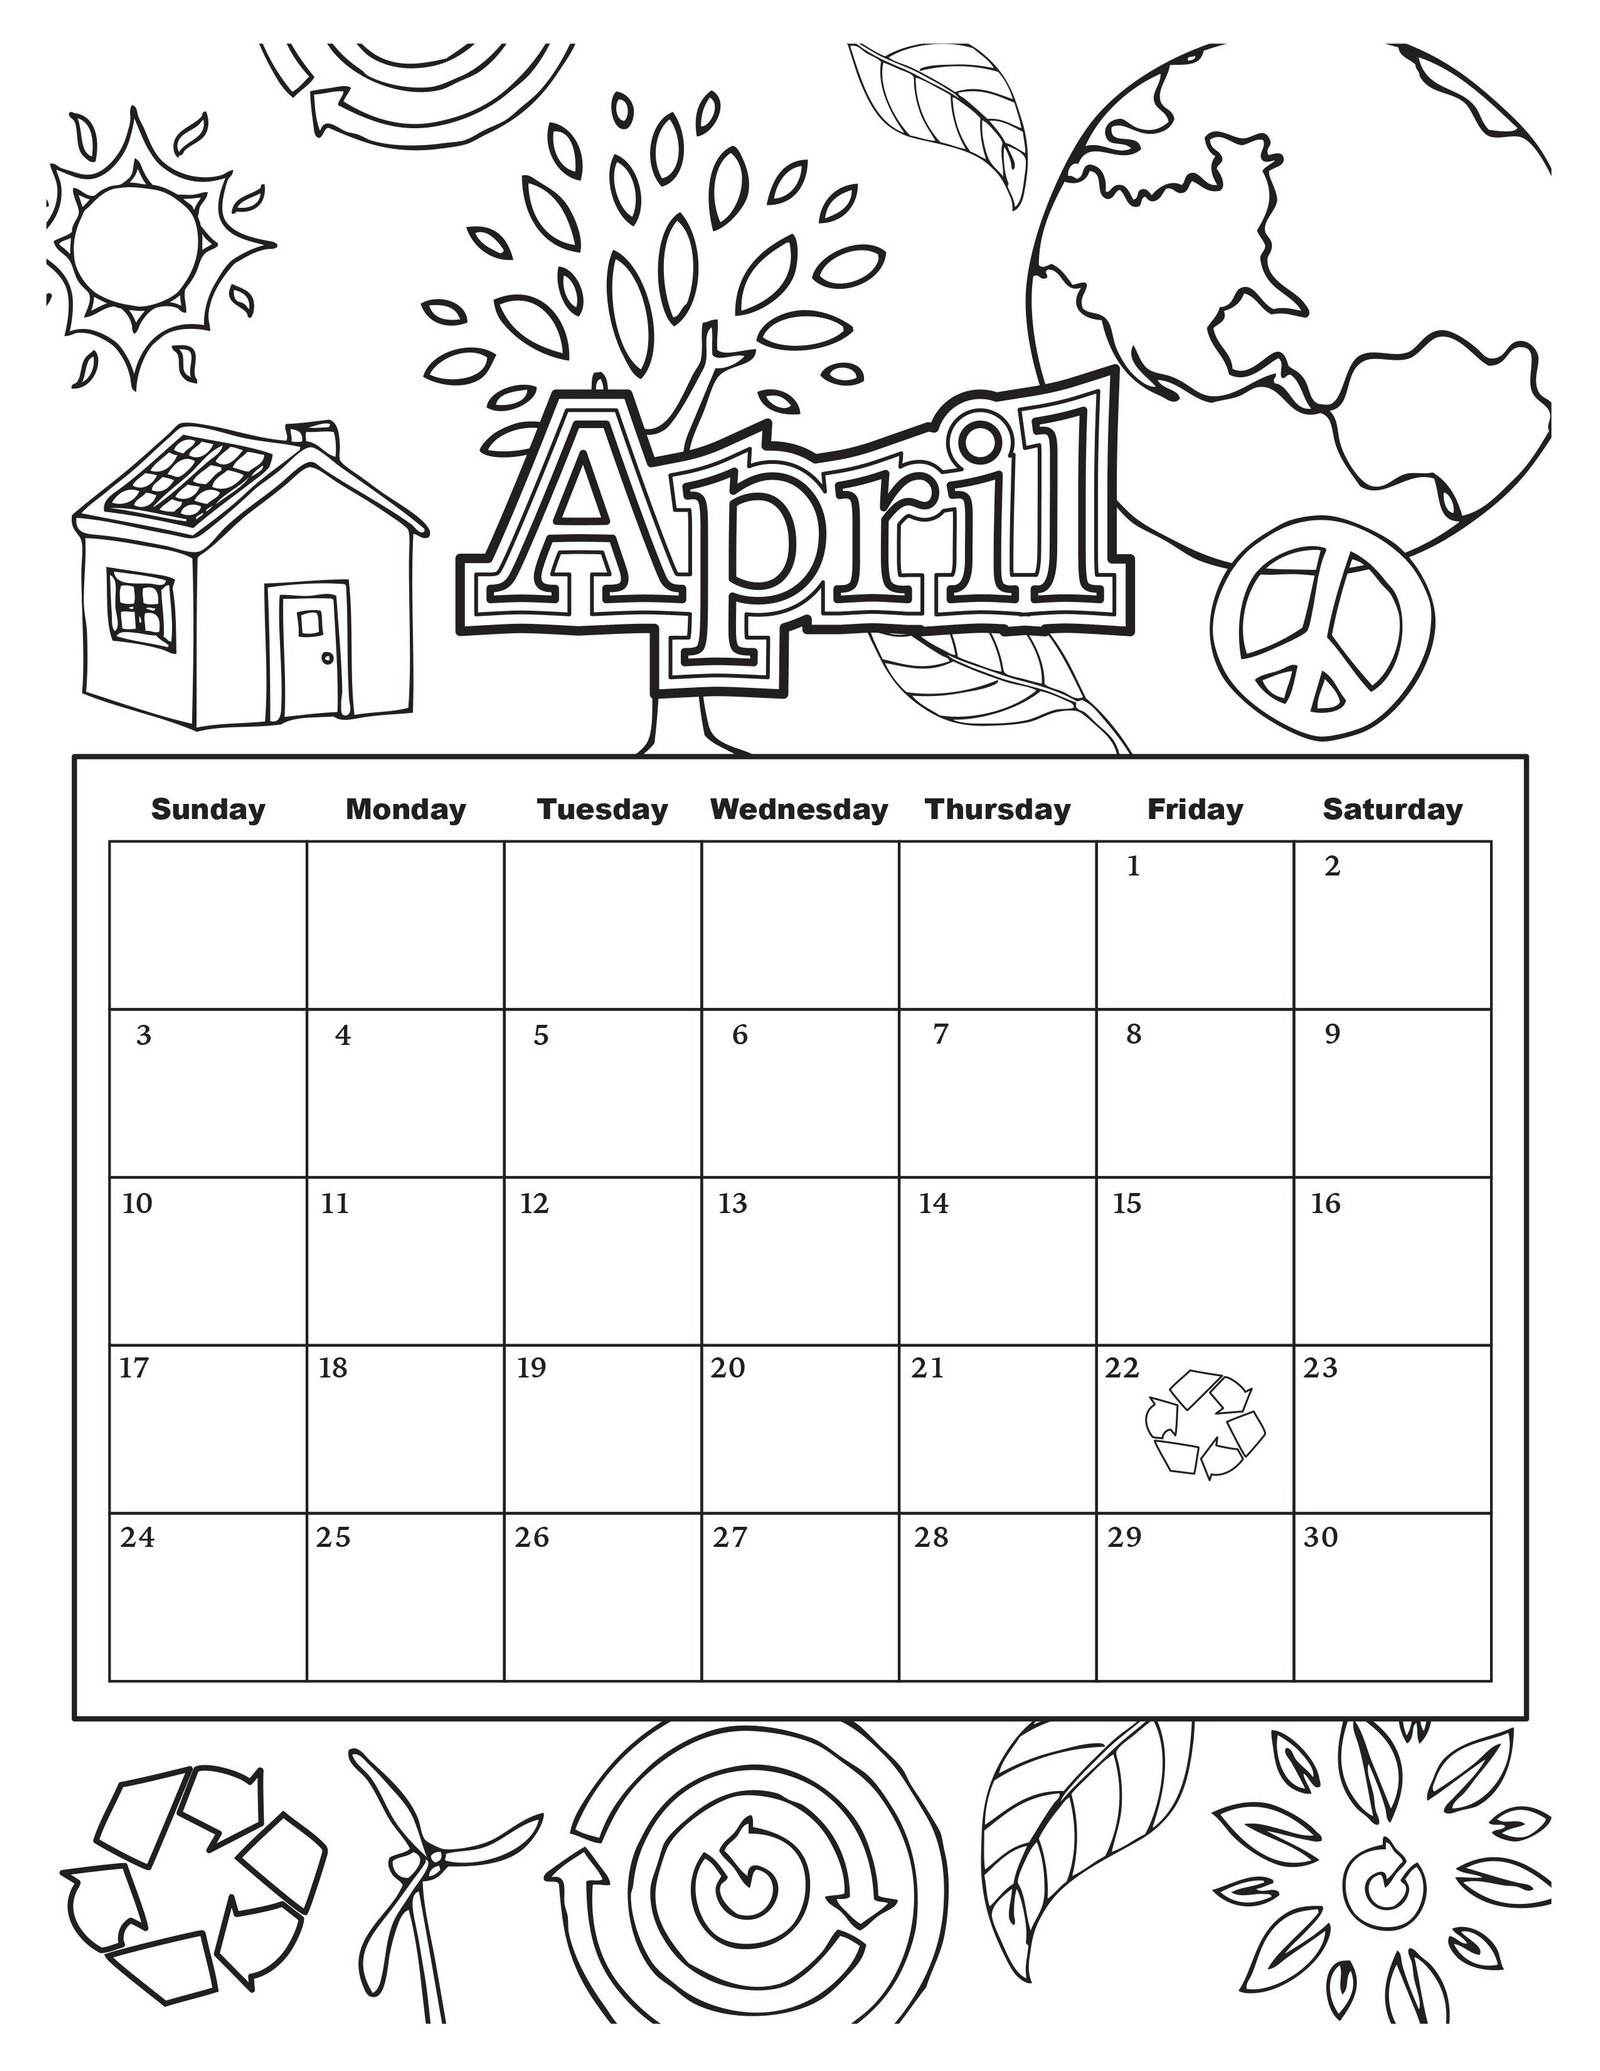 April Environmental Awareness Month Coloring Page